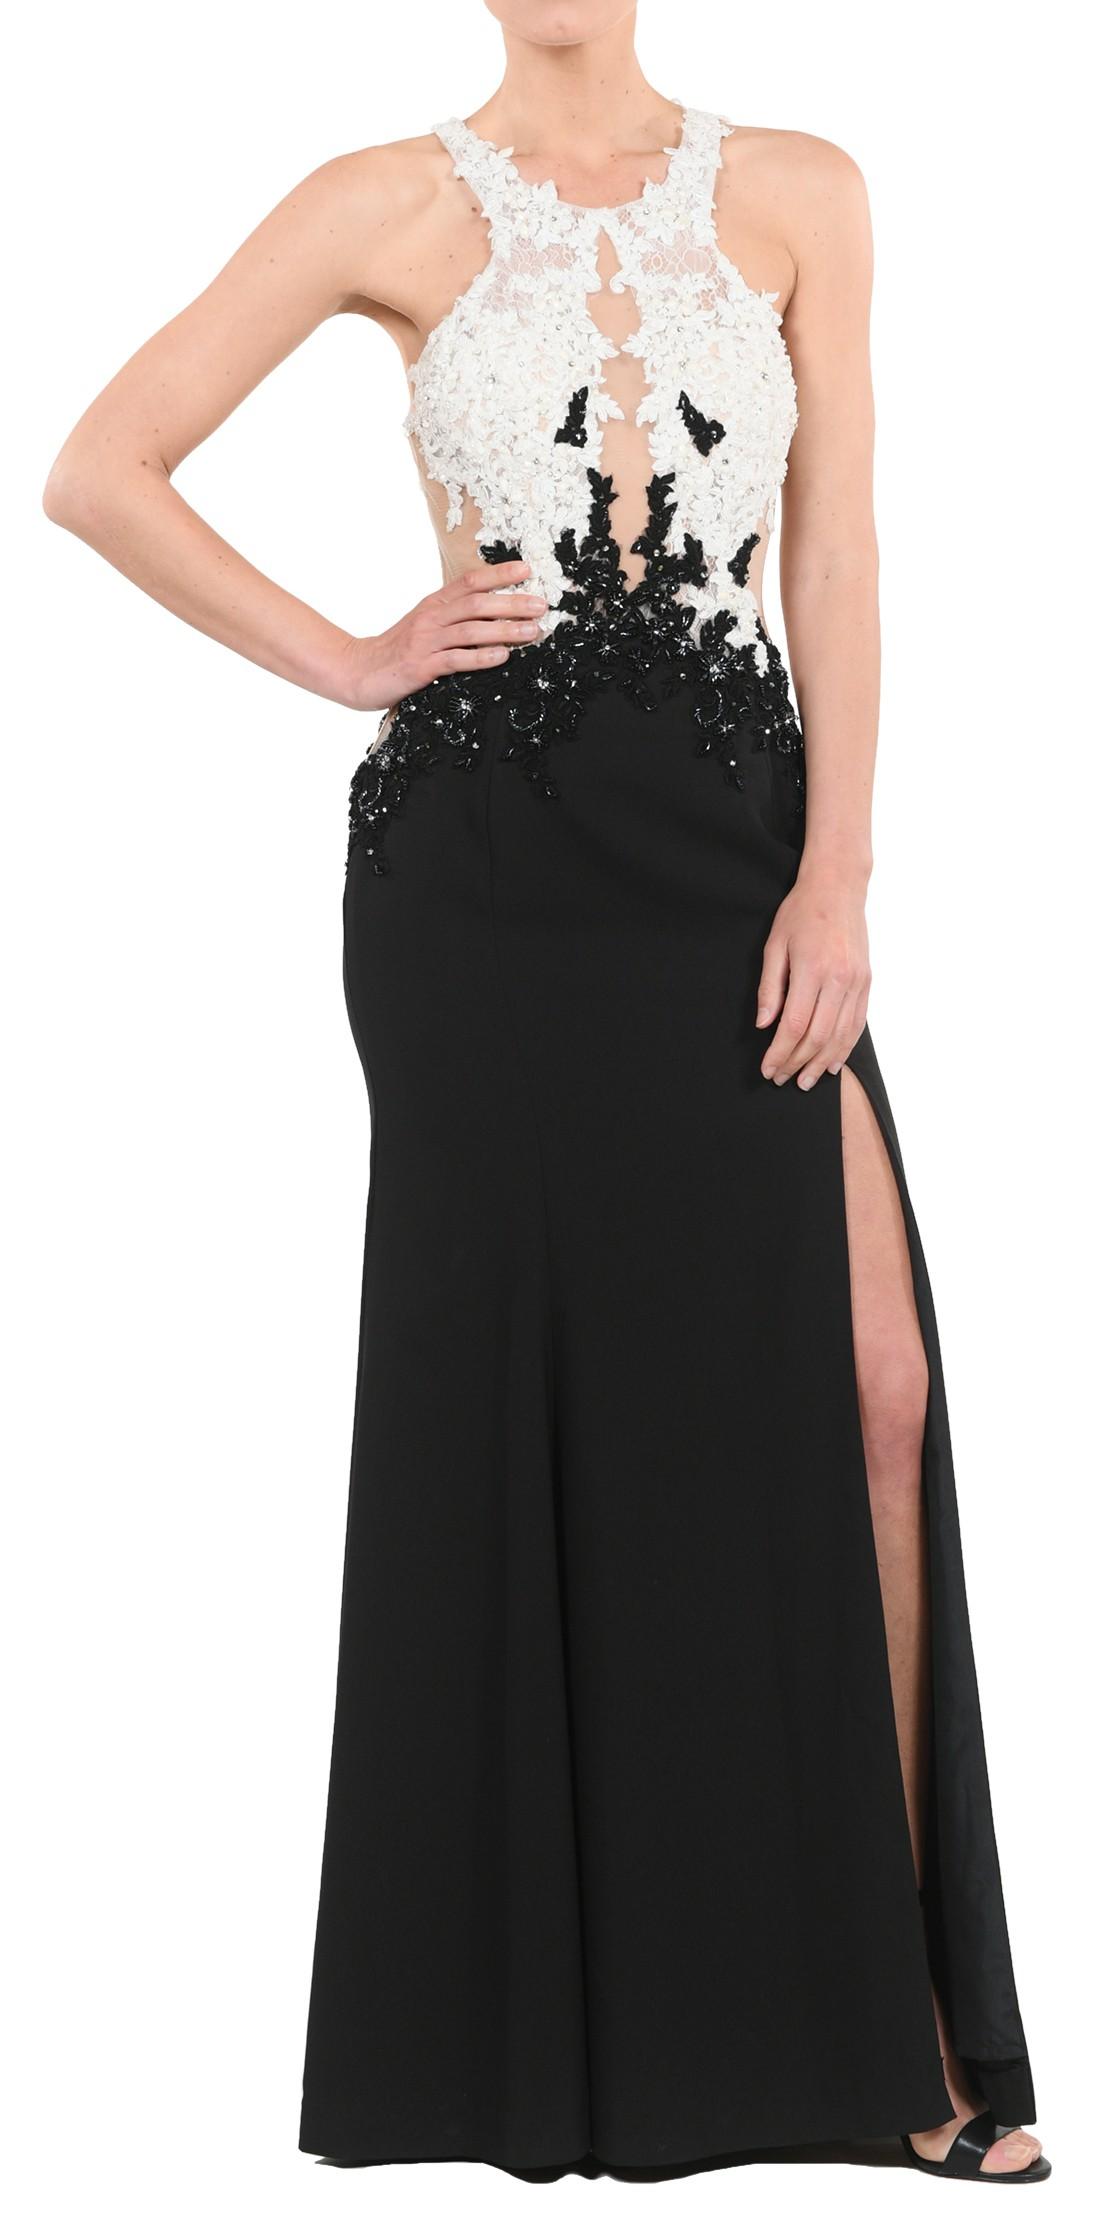 Custom Cutout Lace Gown Evening Dress Rental Lebanon Rent A